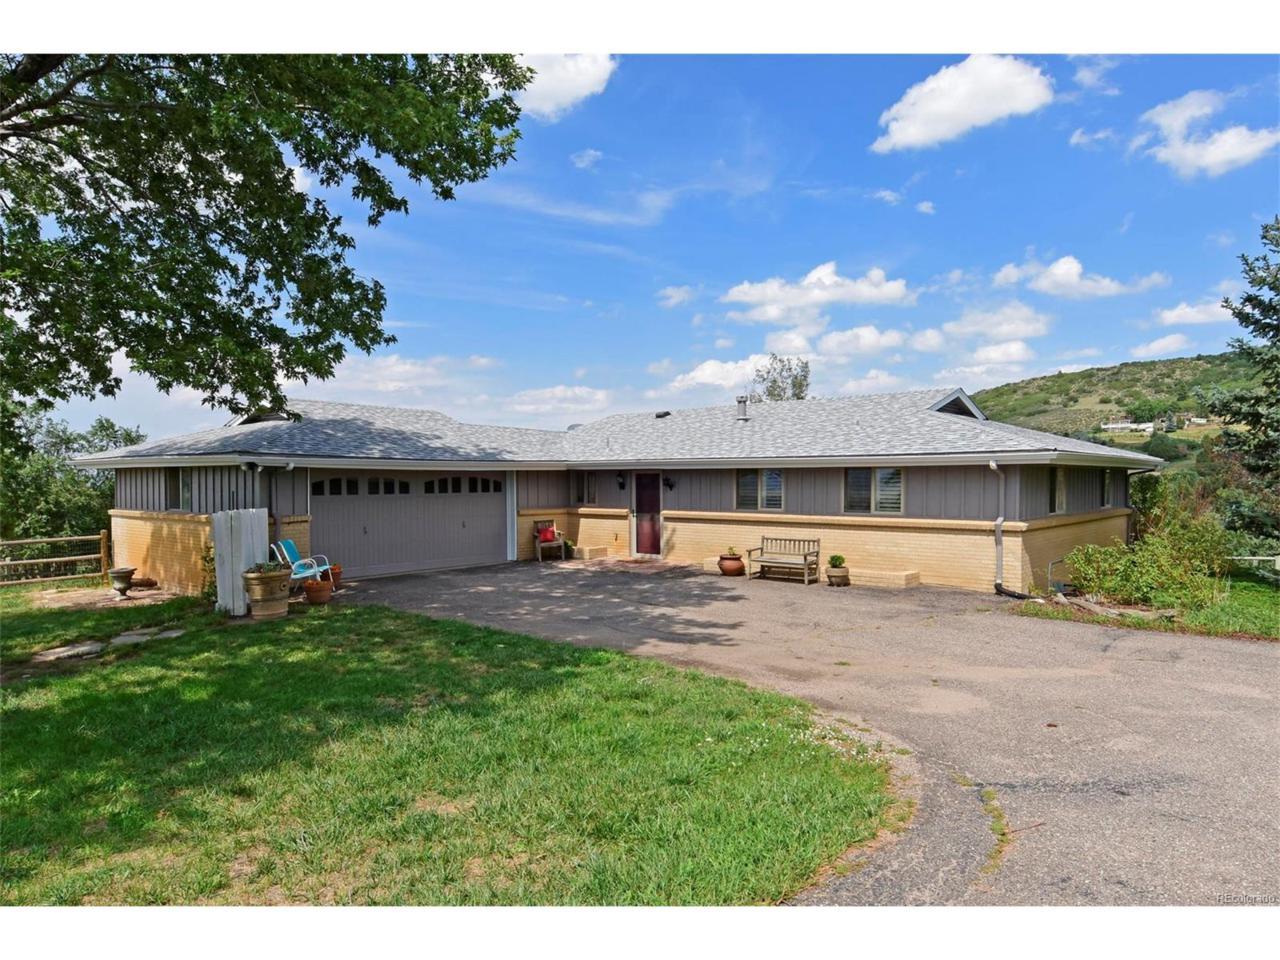 747 N Faver Drive, Castle Rock, CO 80109 (MLS #3322486) :: 8z Real Estate